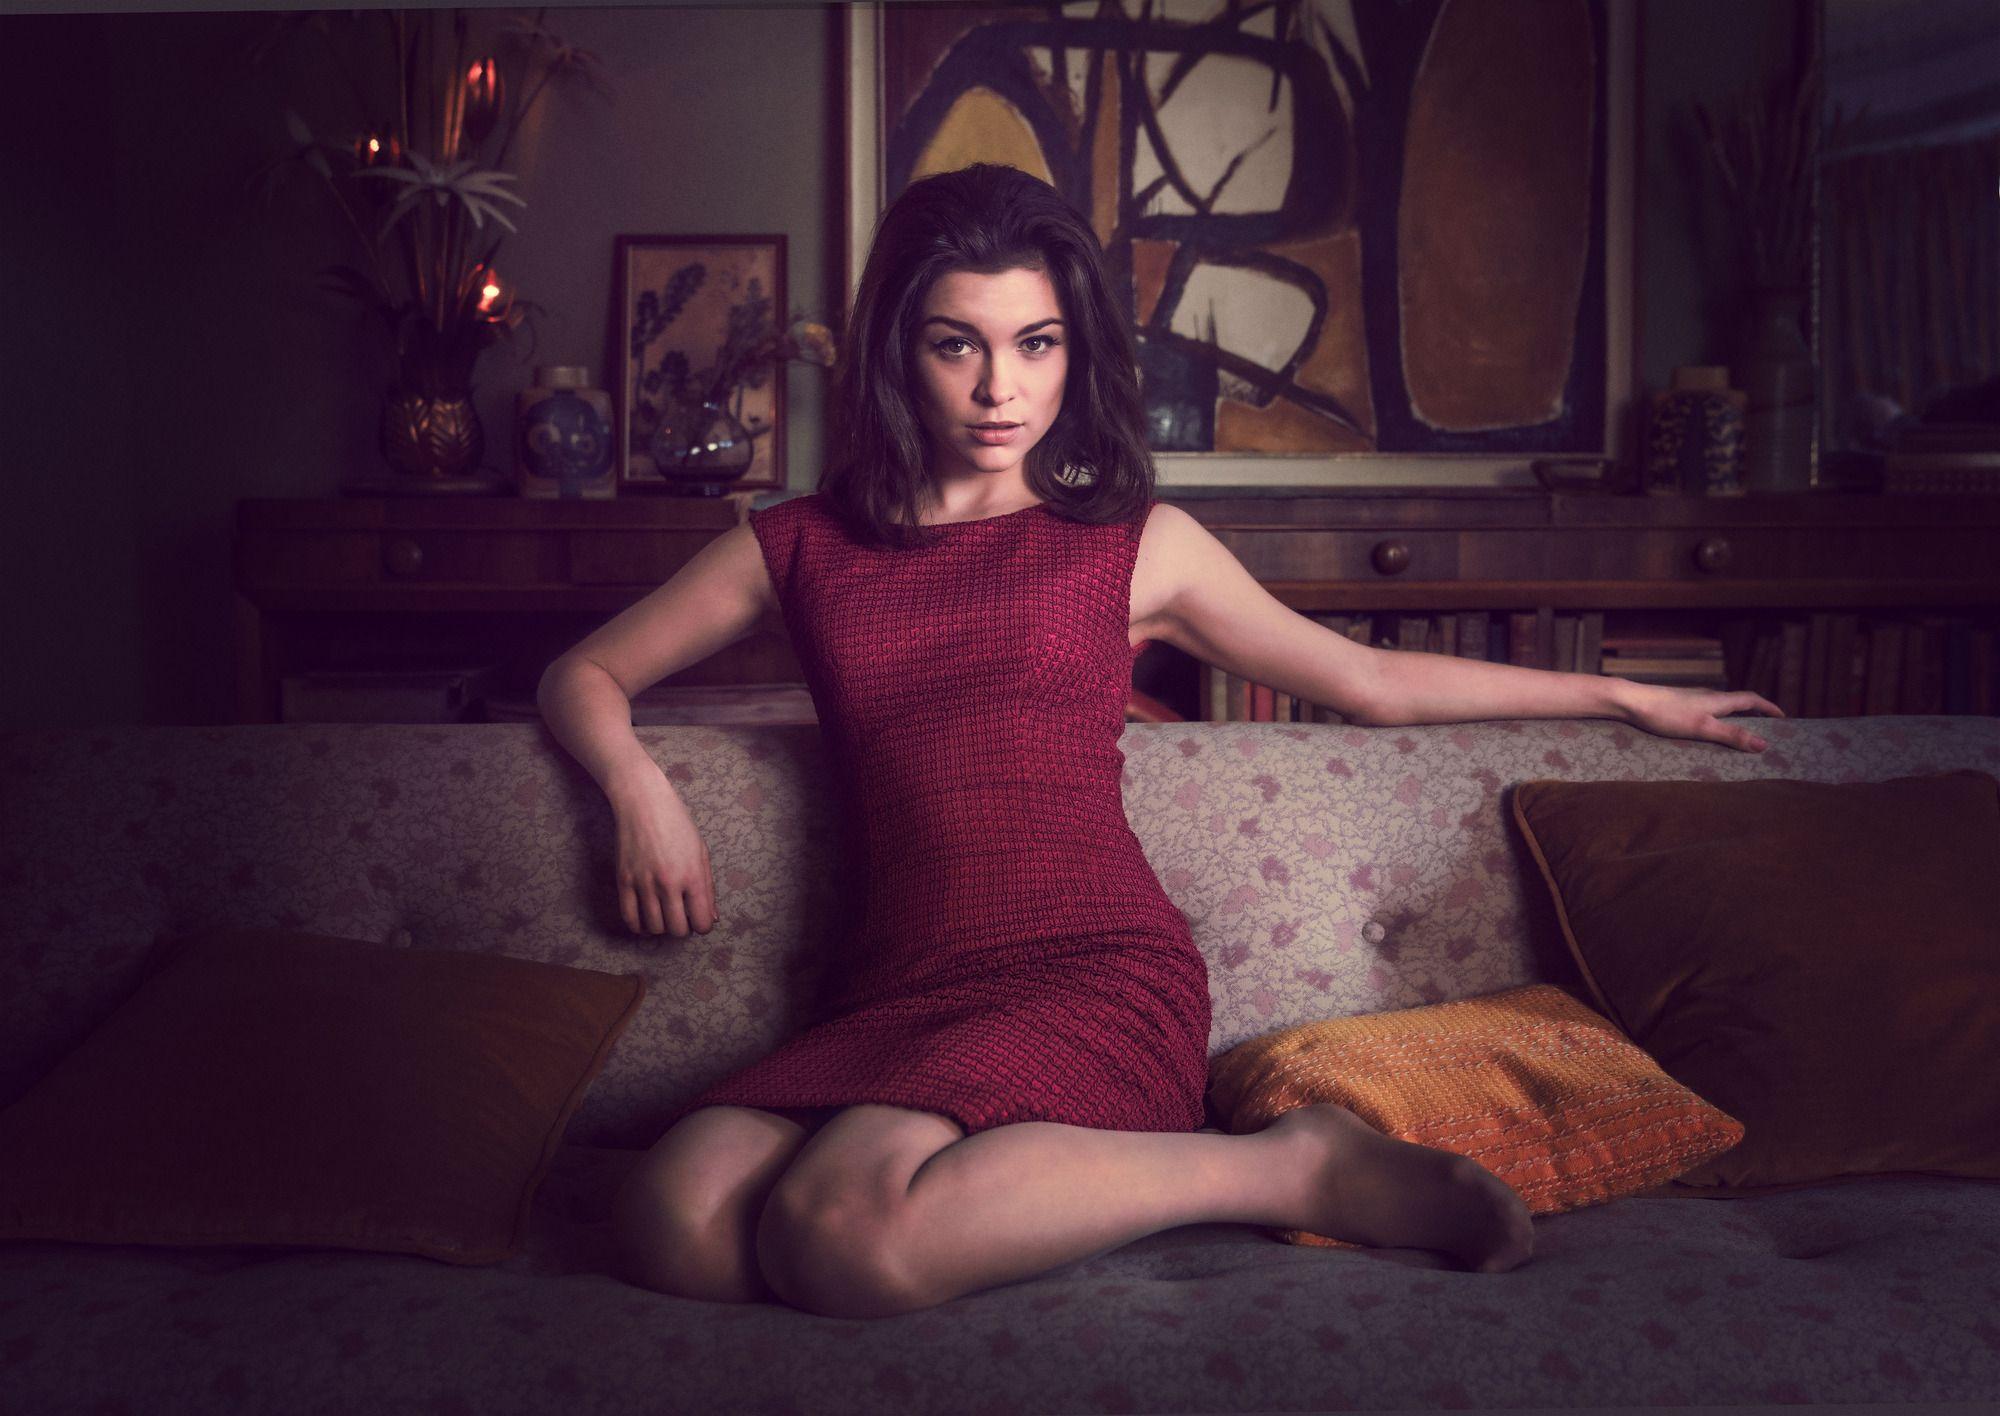 Amelia Fox Naked trial of christine keeler producer on how show debunks key